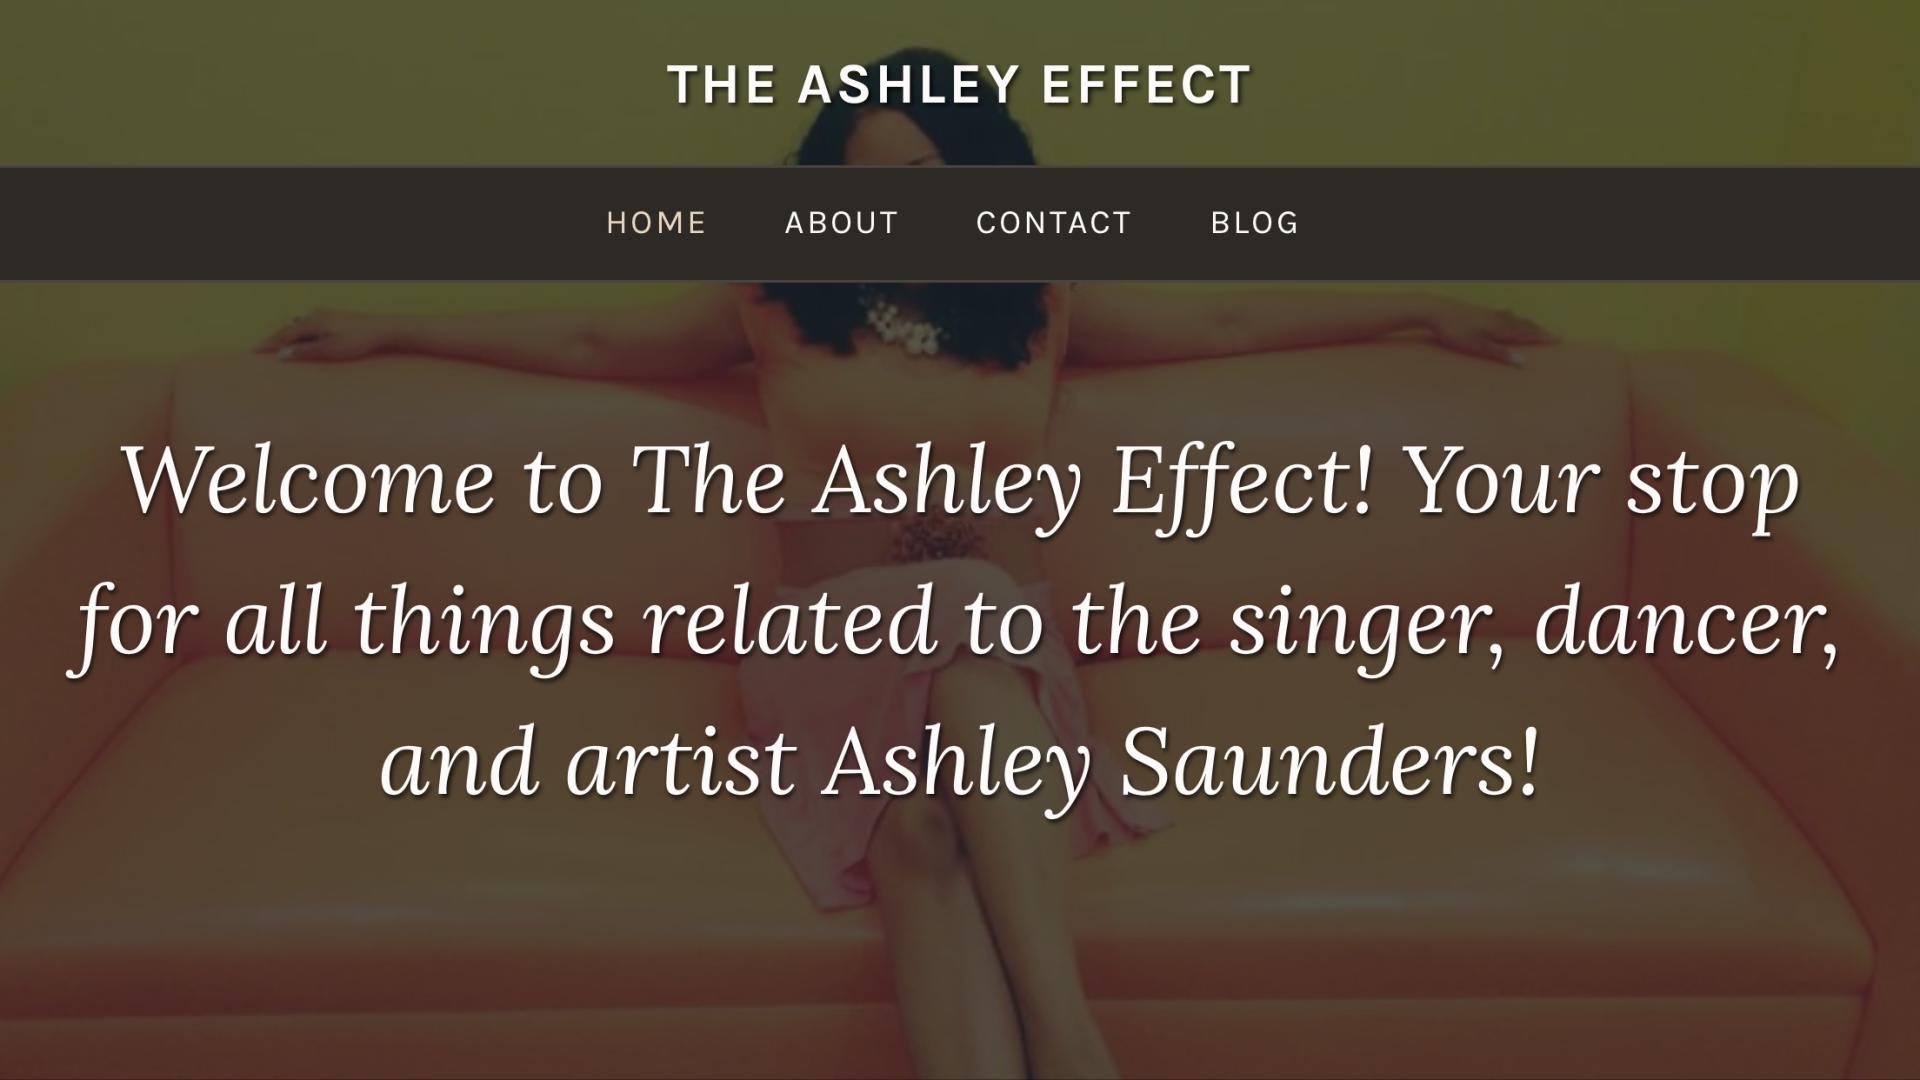 THE ASHLEY EFFECT